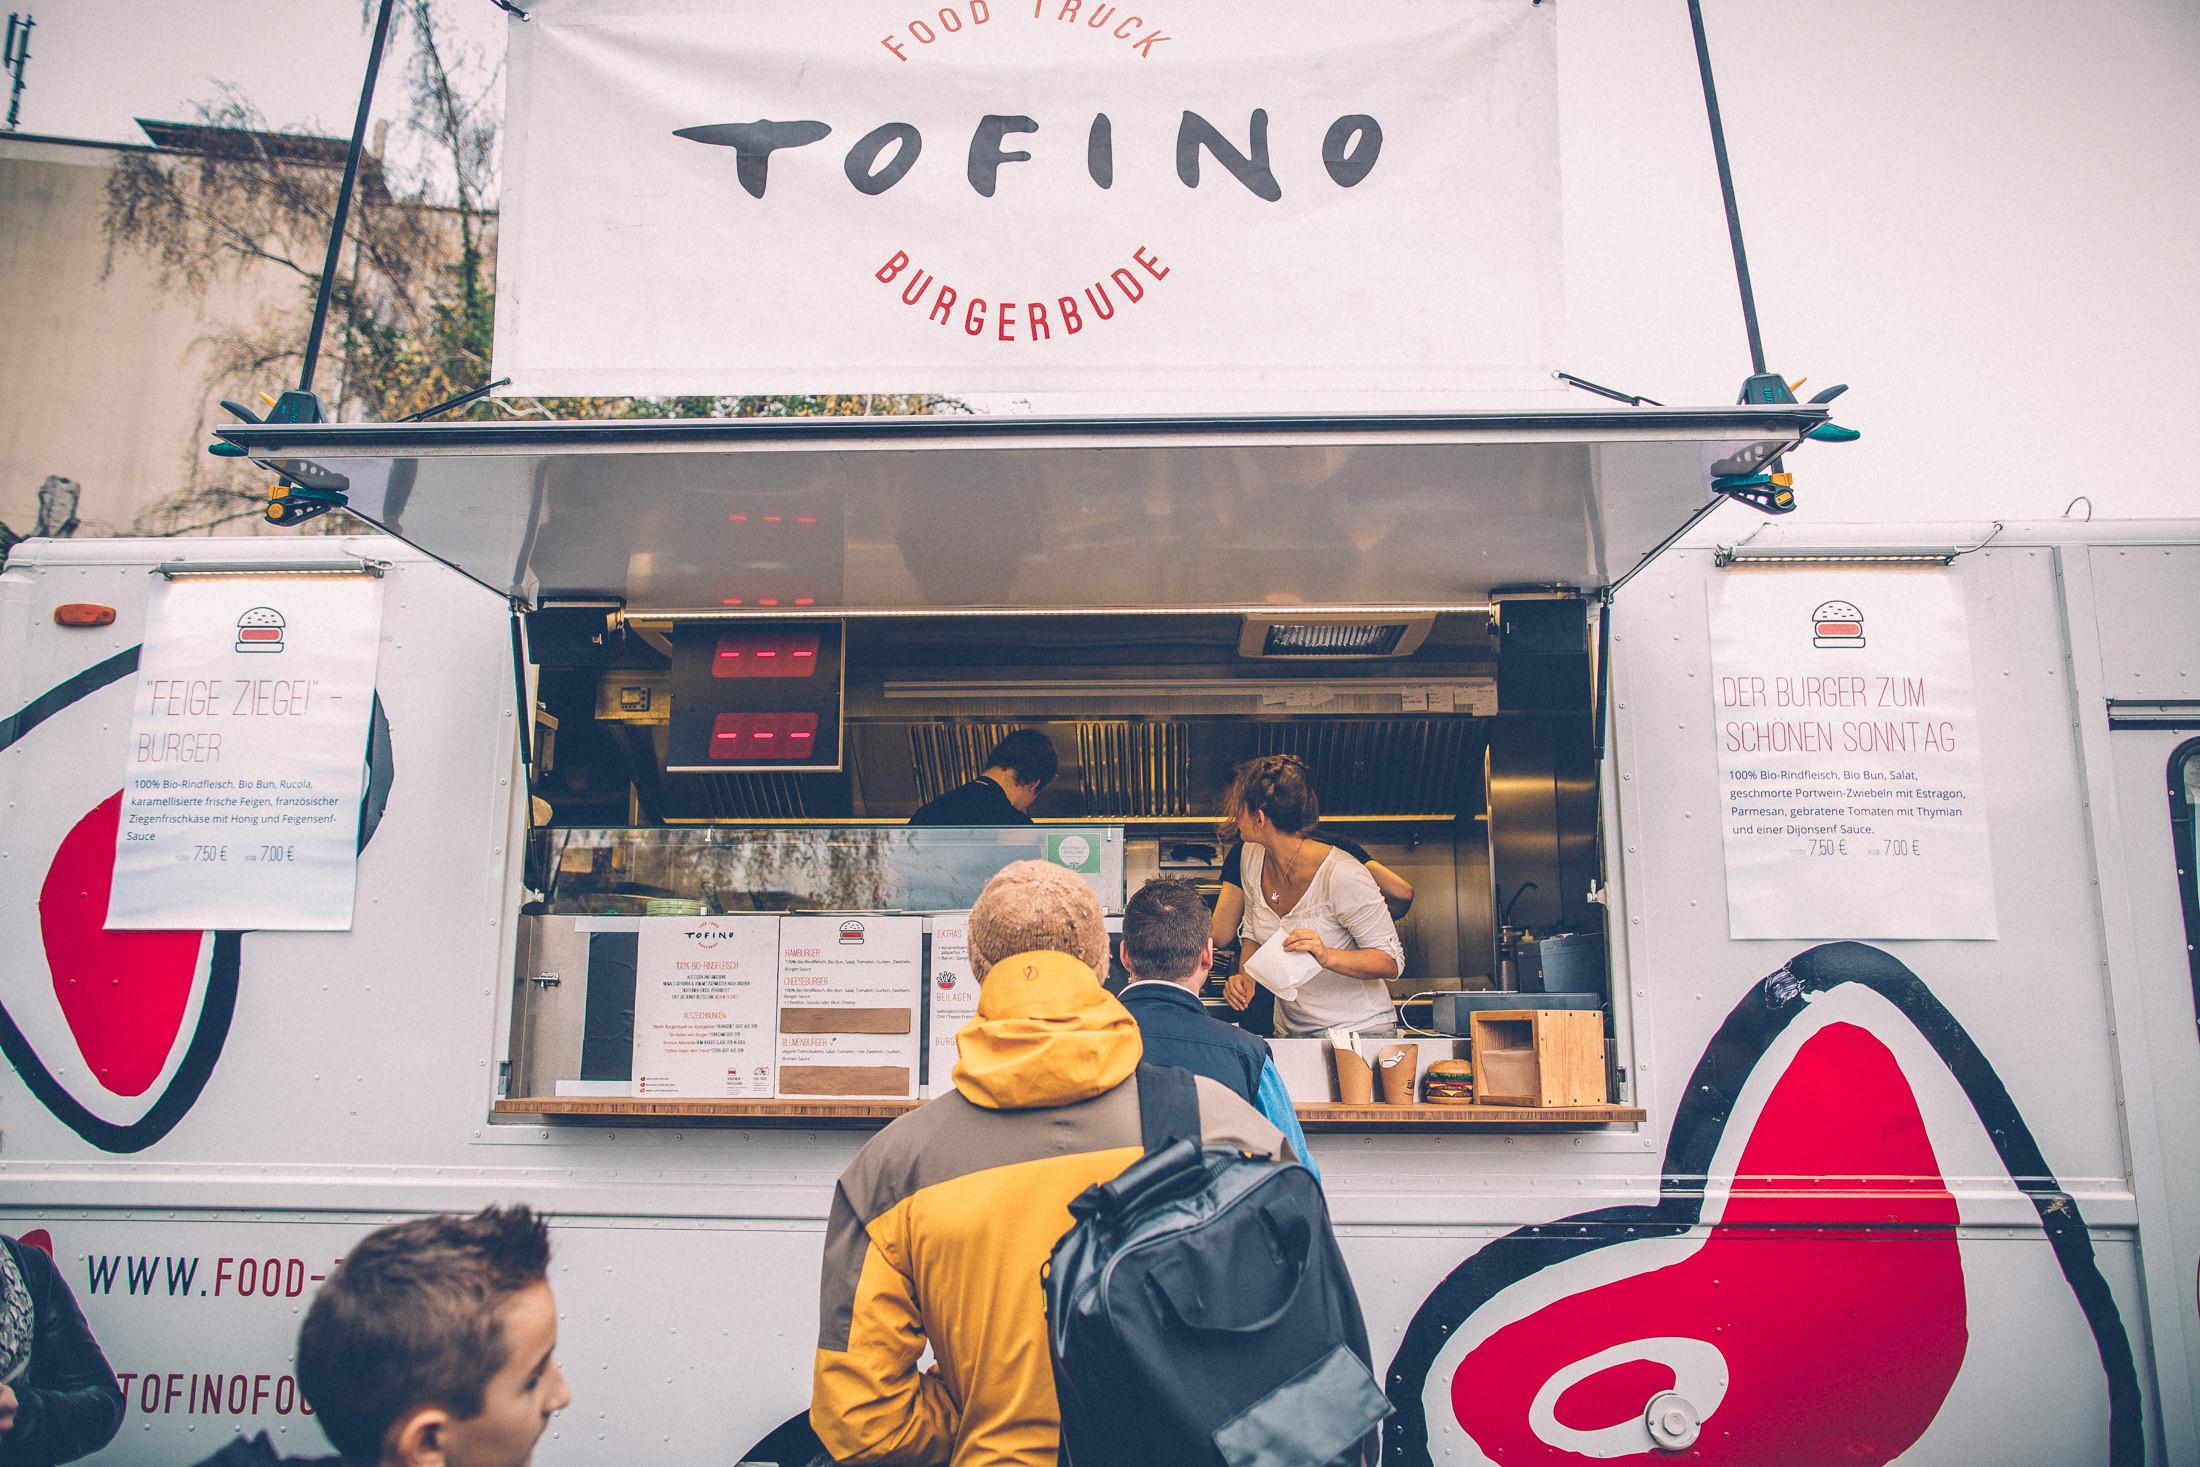 Food Truck Catering für 30 Personen